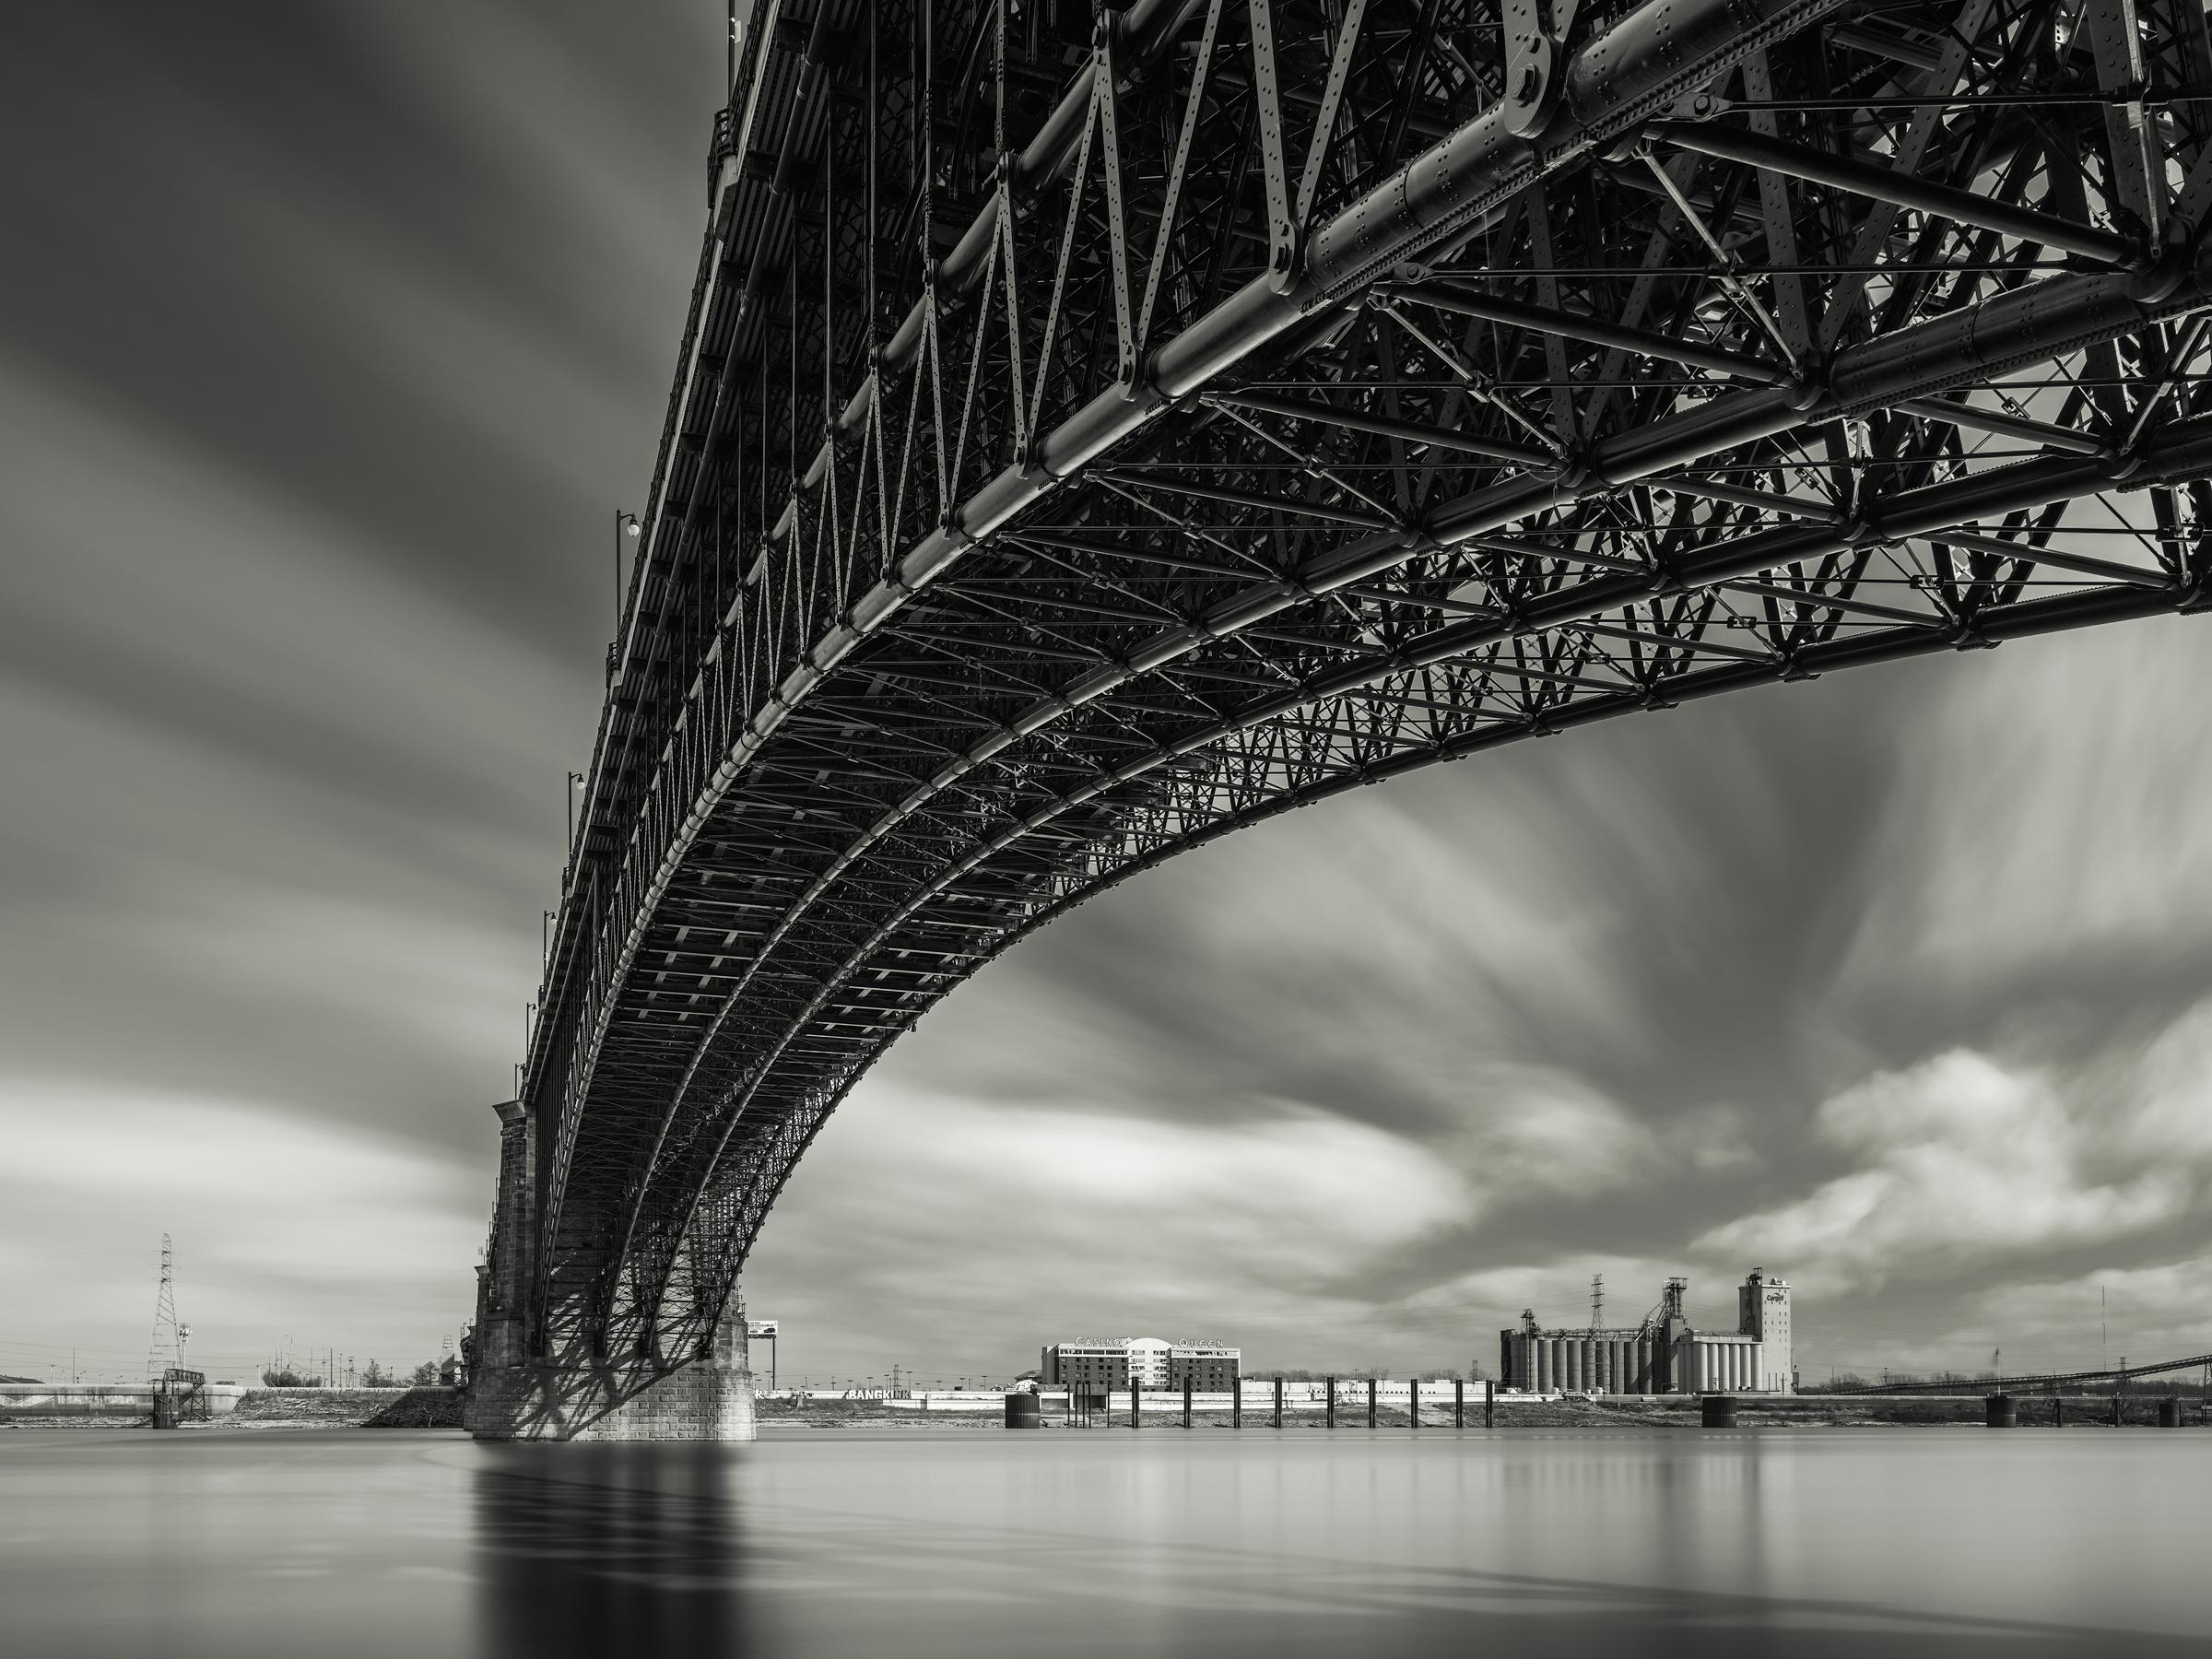 Eads Bridge, St Louis, MO - Fuji GFX50s and a Fujinon GF23mm f4 R WR   ISO 100 at f11 for 240 seconds.